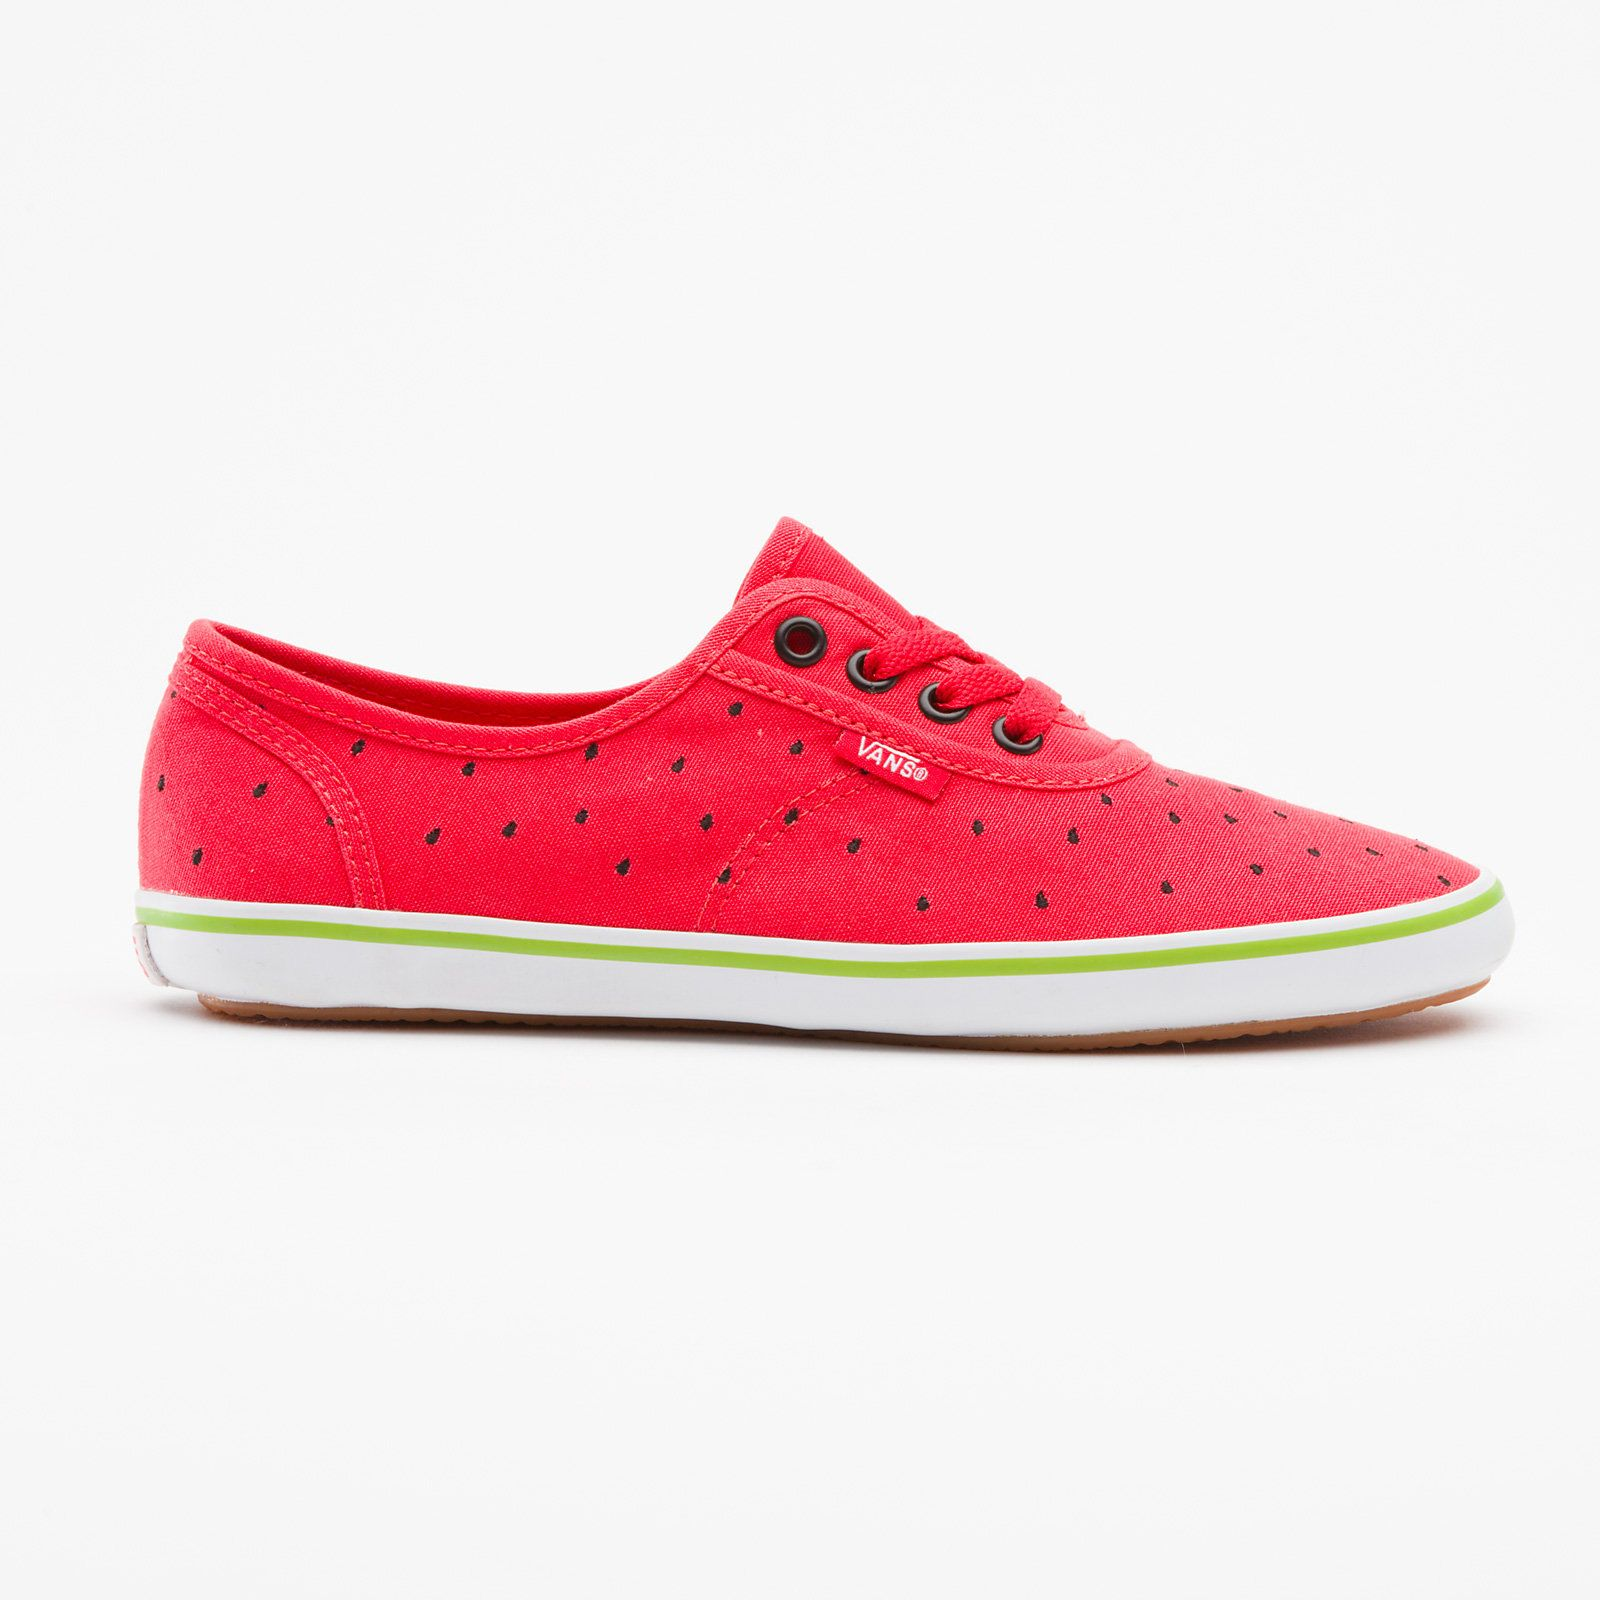 b02cc3eb0e Watermelon vans! OMG I want these!!! Dylan  hint hint  (